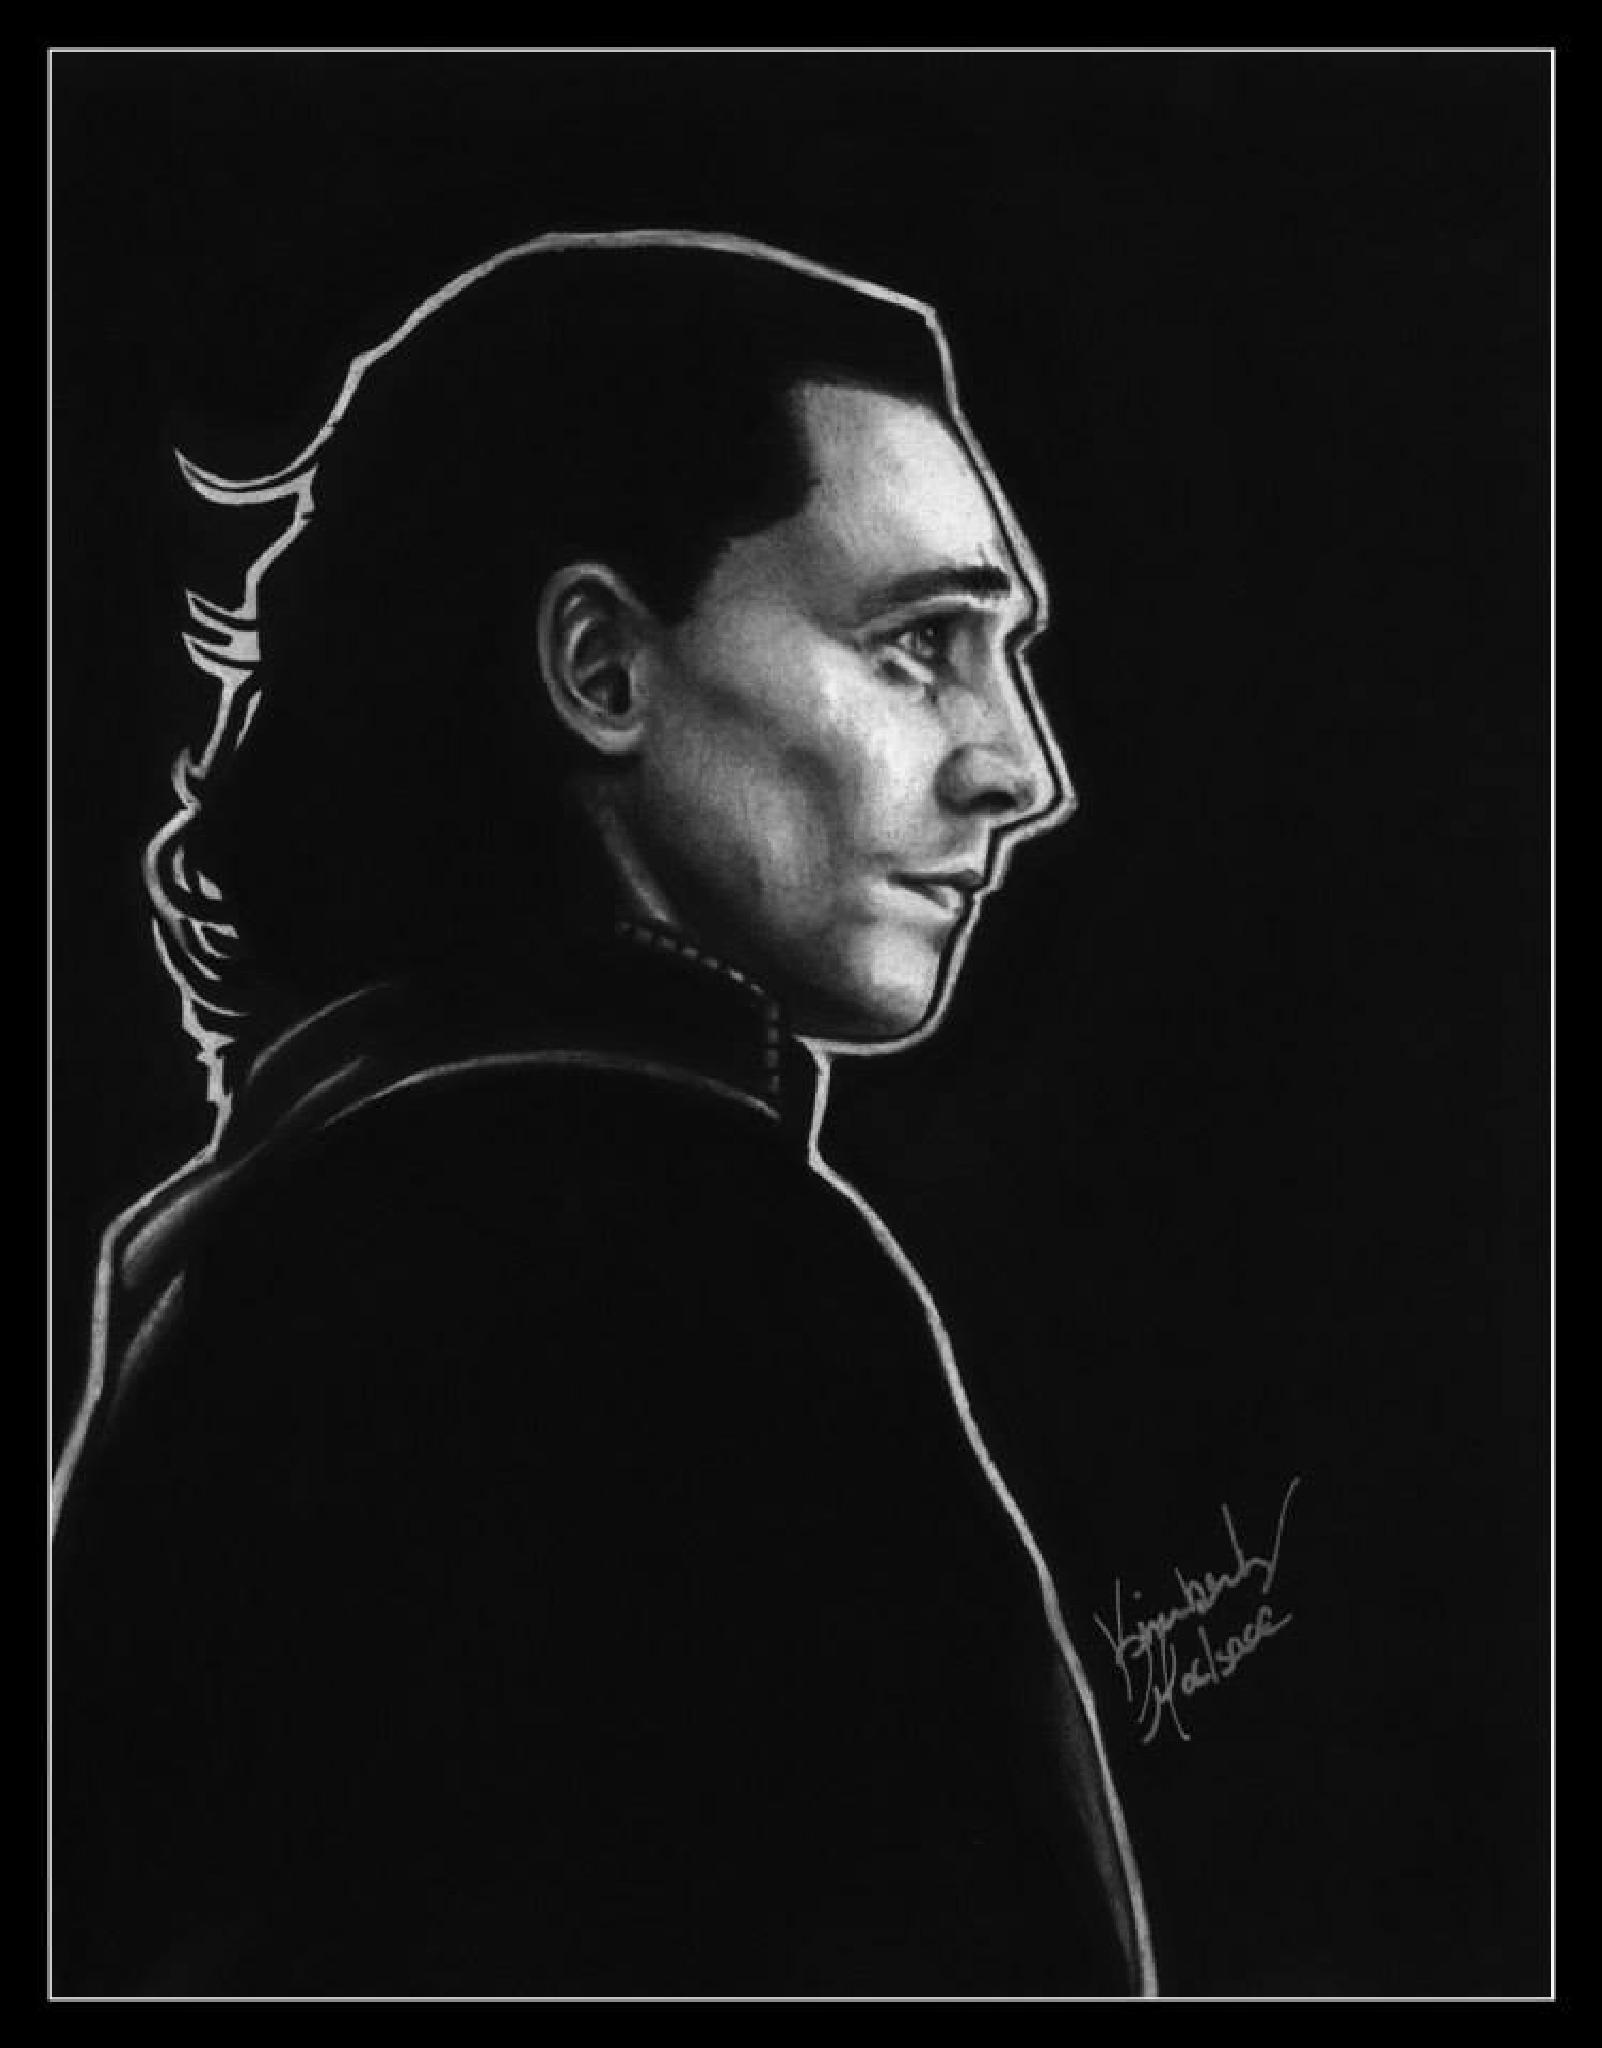 Loki by Kimberly MacIsaac